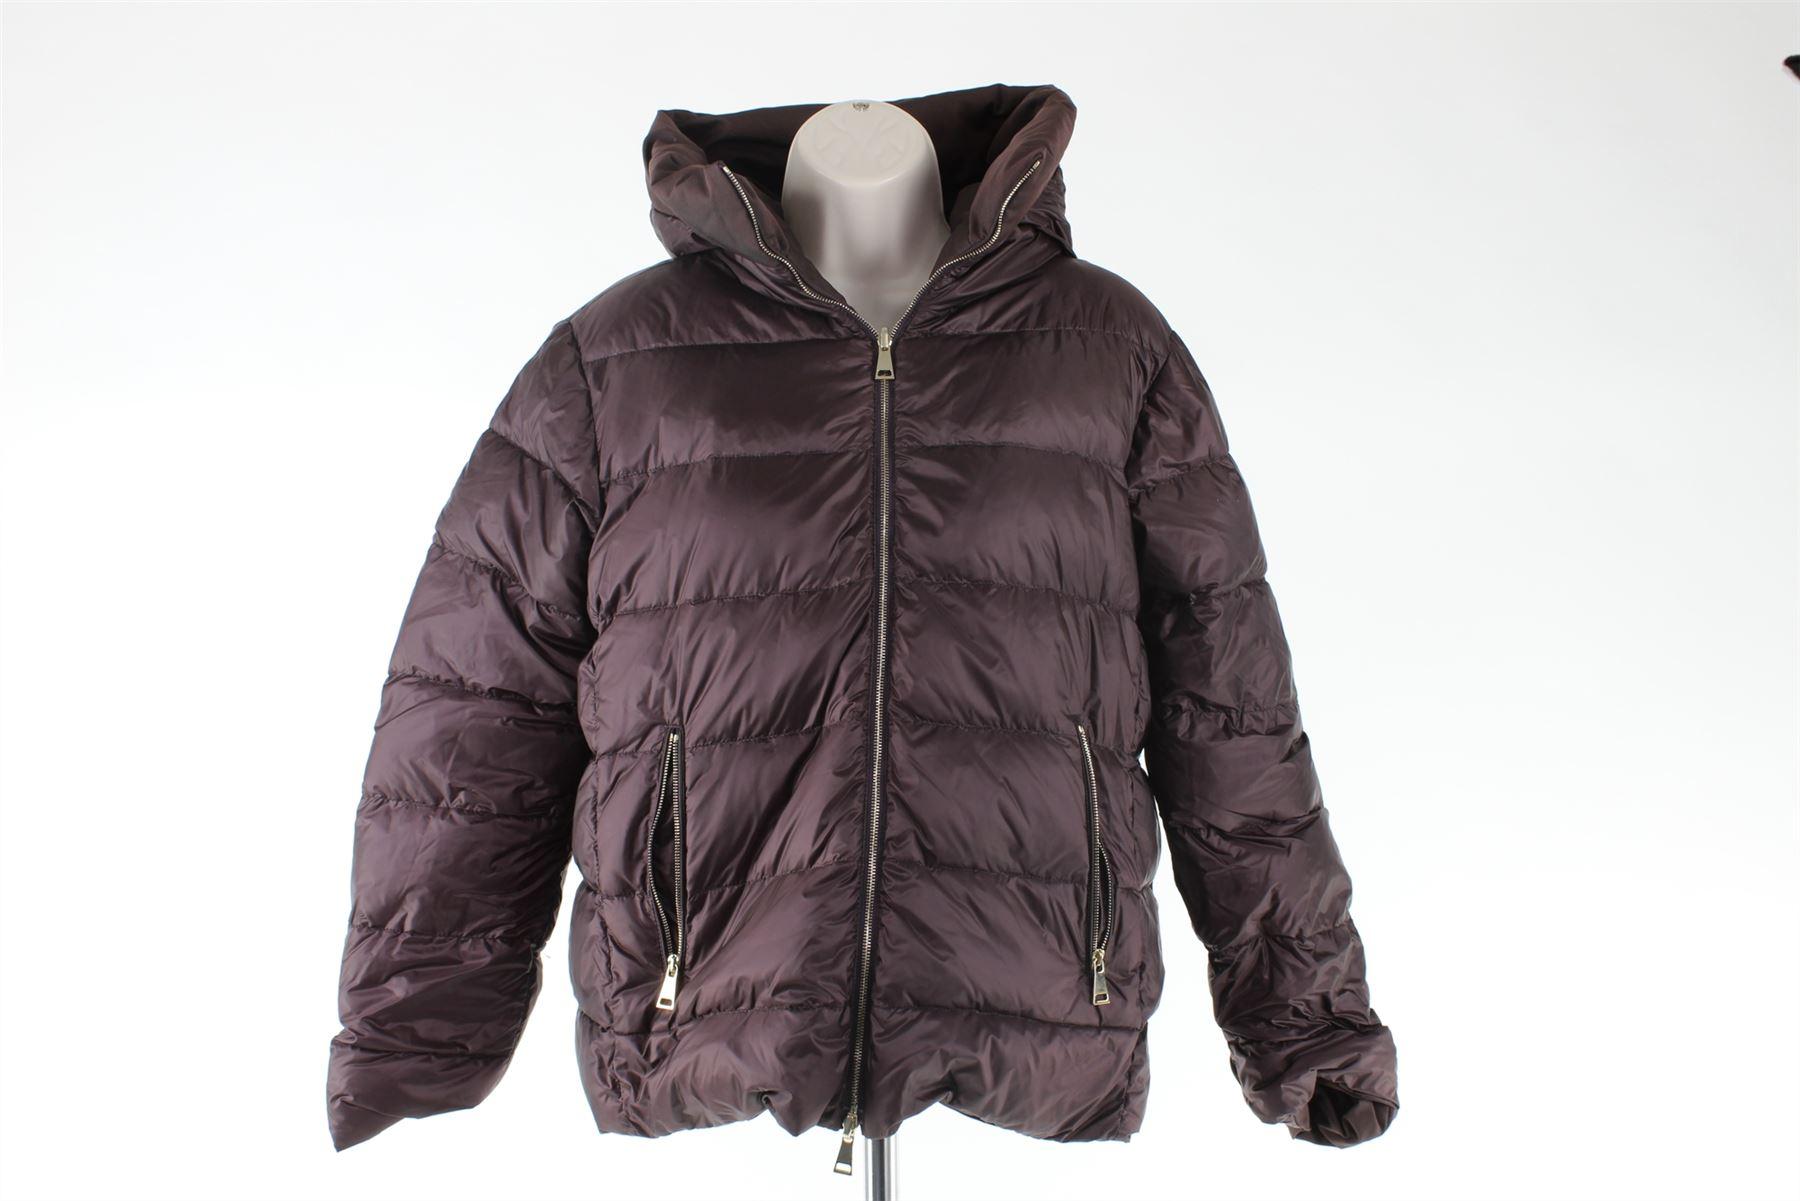 f02427a11 Details about MONCLER Caen Burgundy Reversible Jacket, Size S